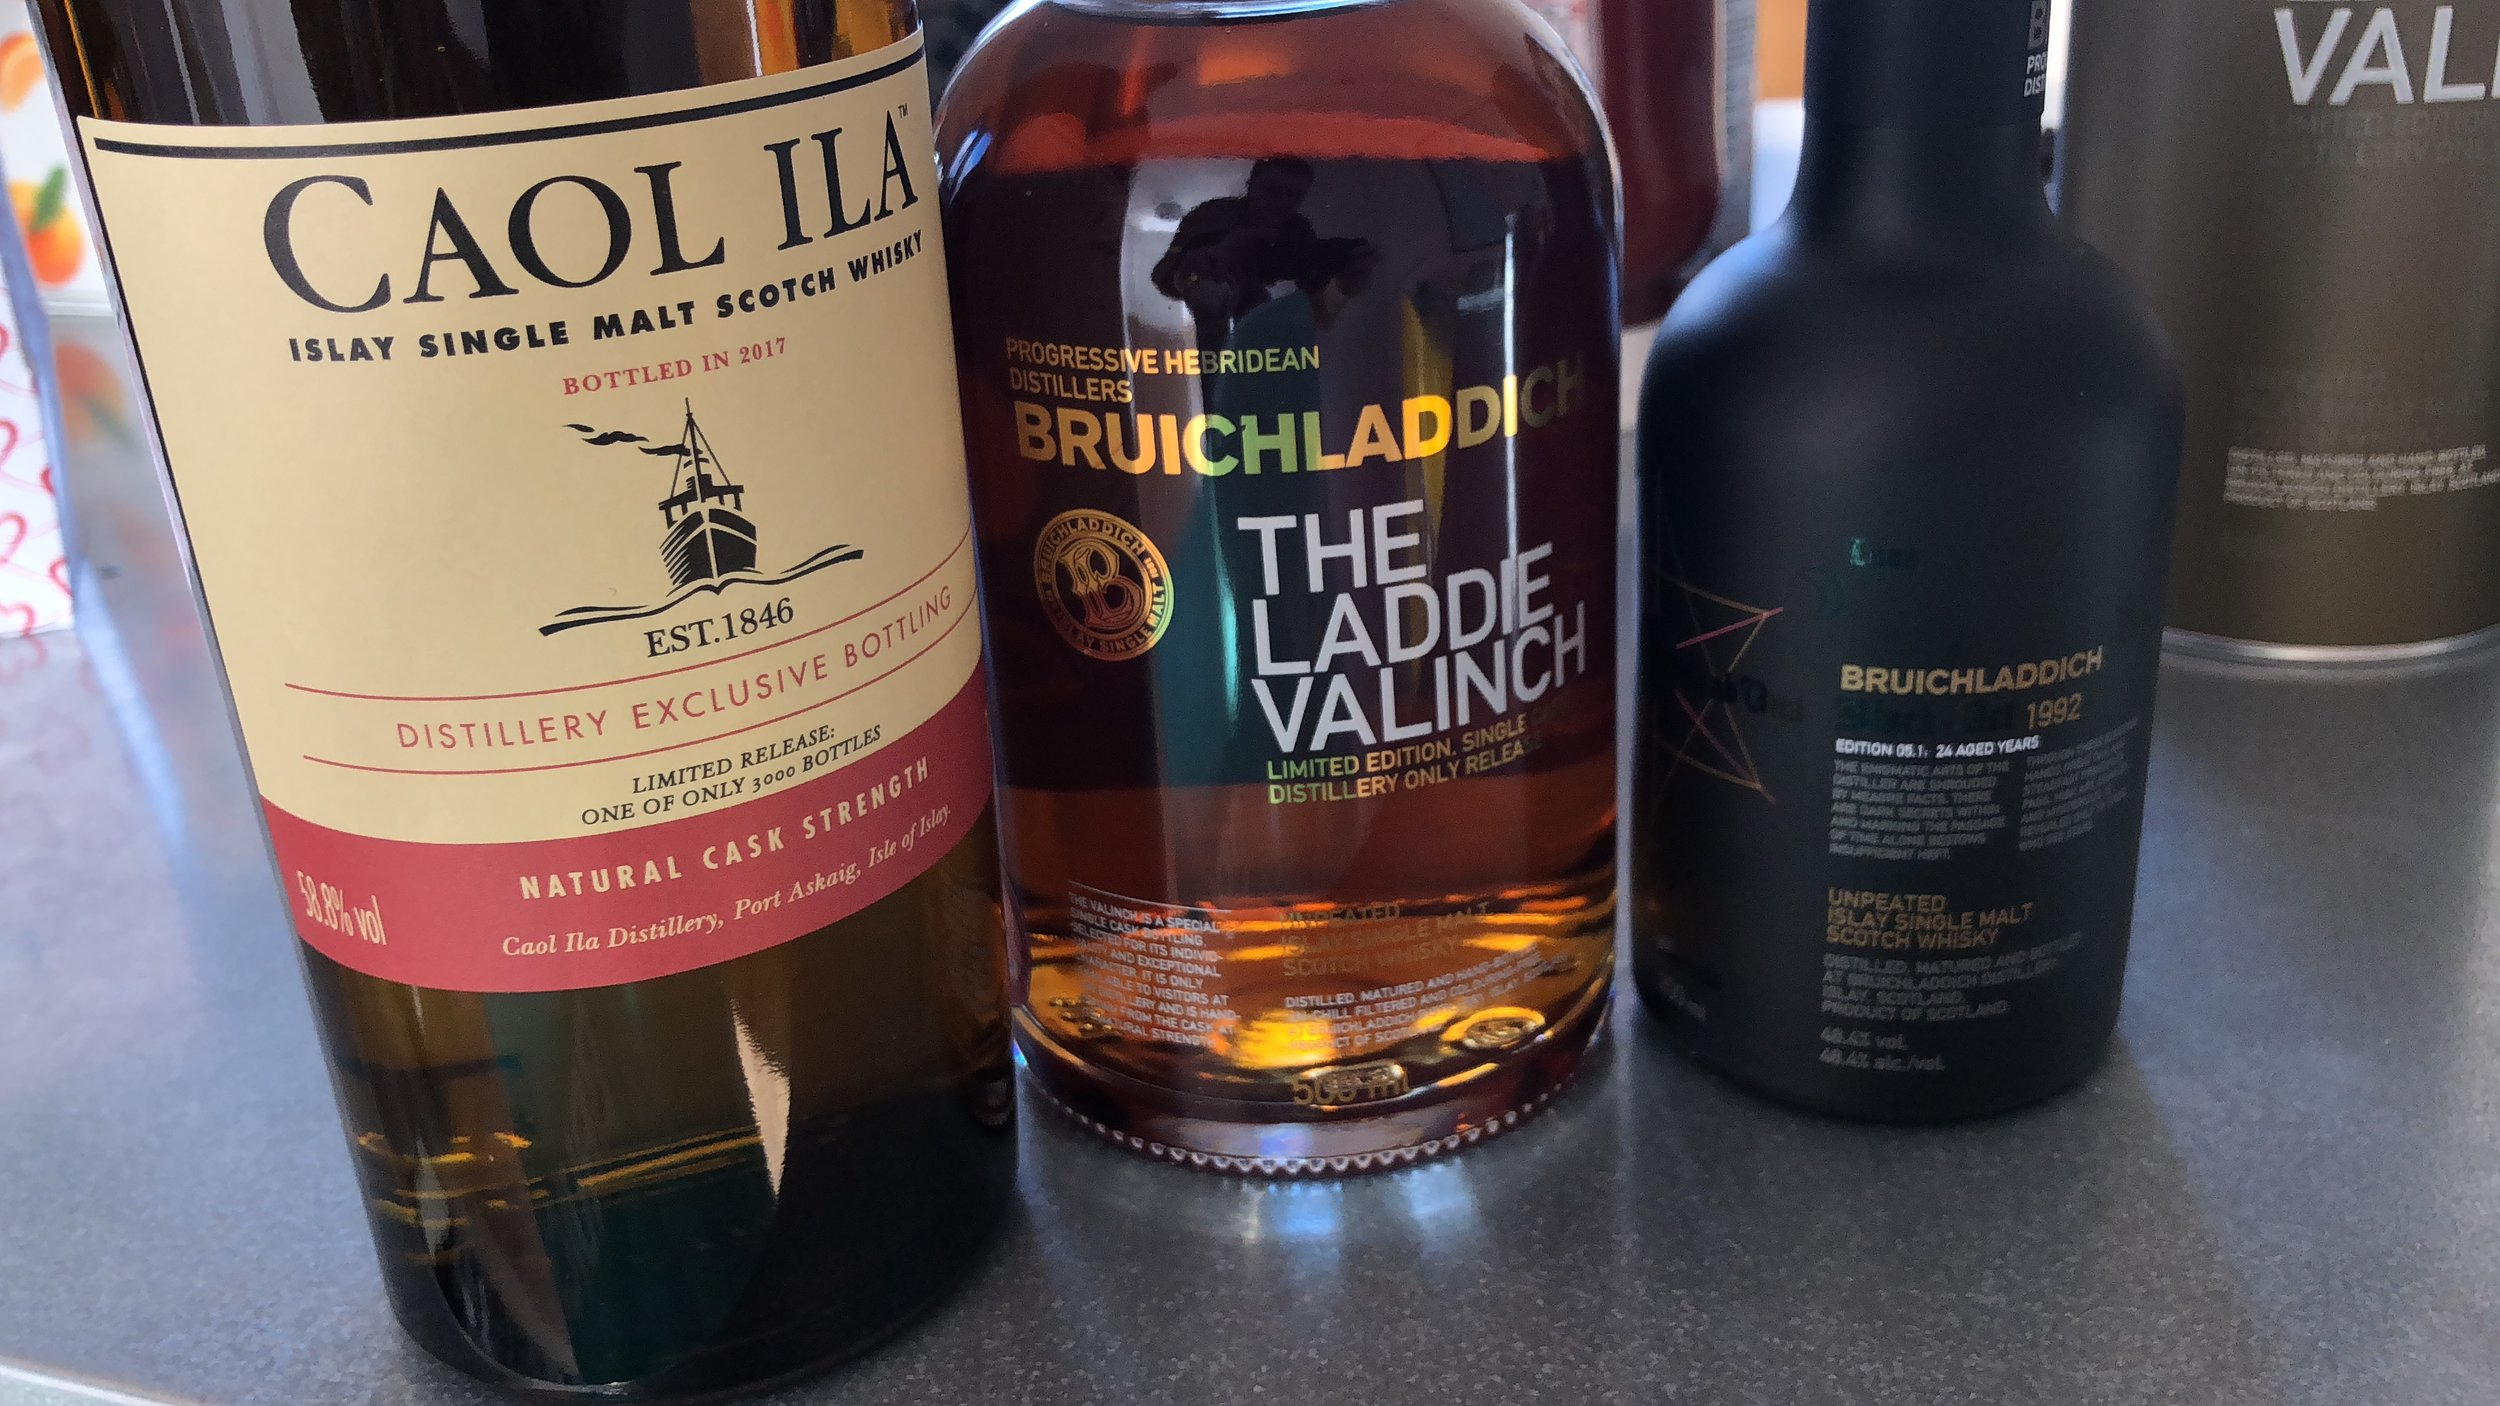 Caol Ila and Bruichladdich bottles